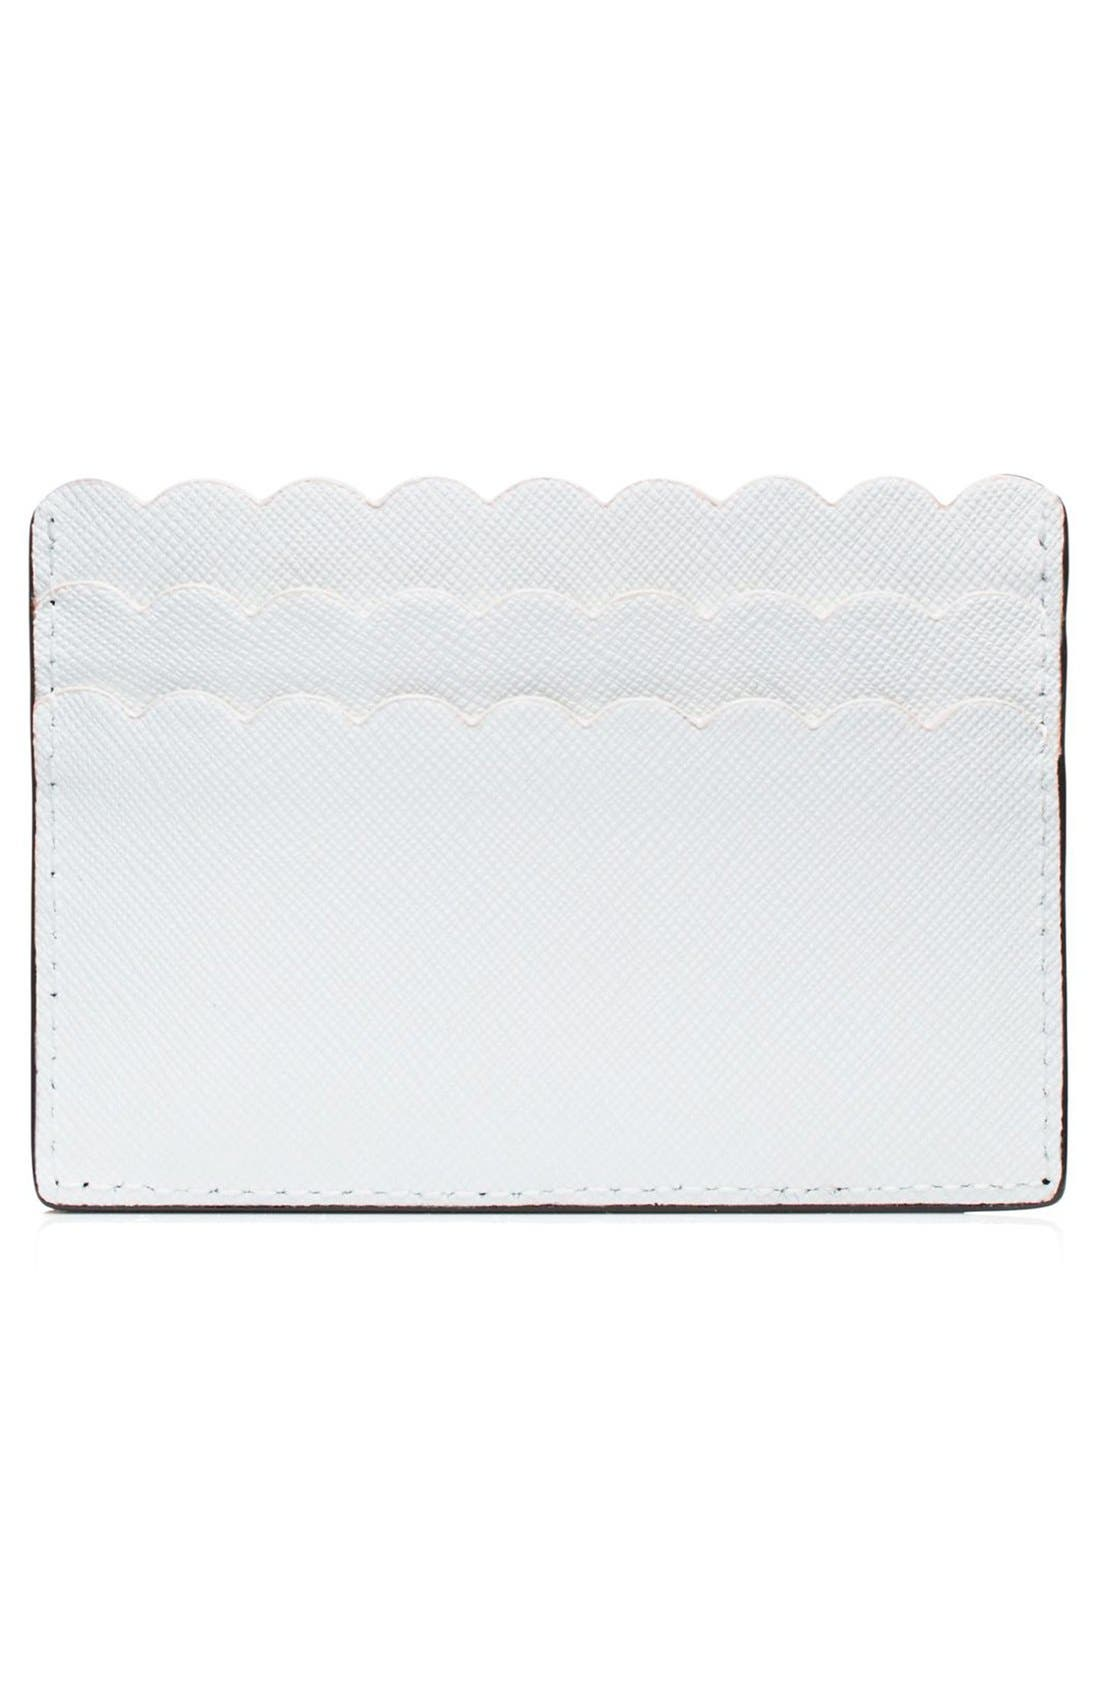 'cape drive' saffiano leather card holder,                             Alternate thumbnail 2, color,                             001